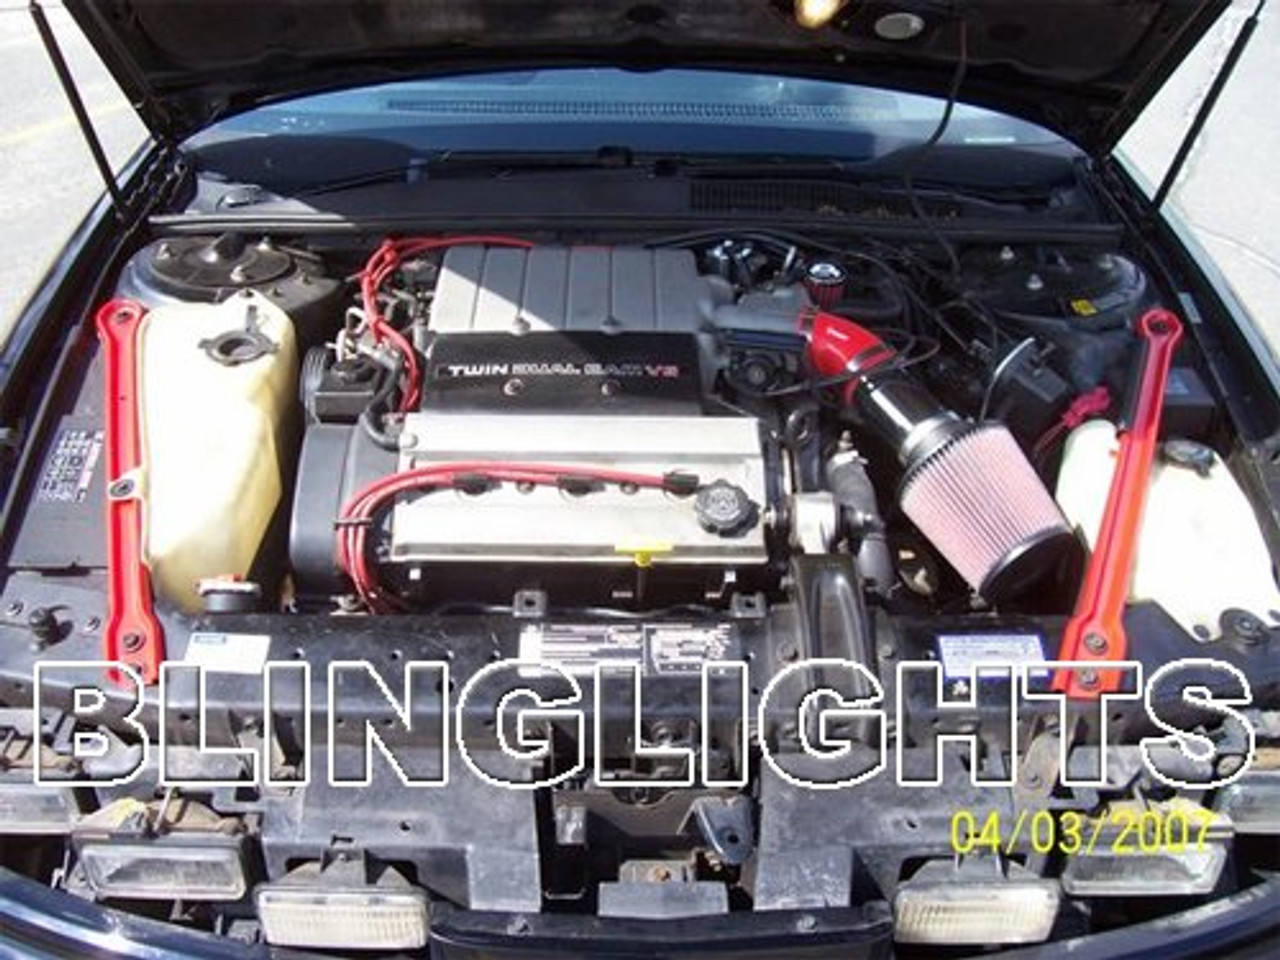 1992 1993 1994 1995 1996 1997 Oldsmobile Cutlass Supreme 3.4L LQ1 V6 Air Intake 3.4 L Engine